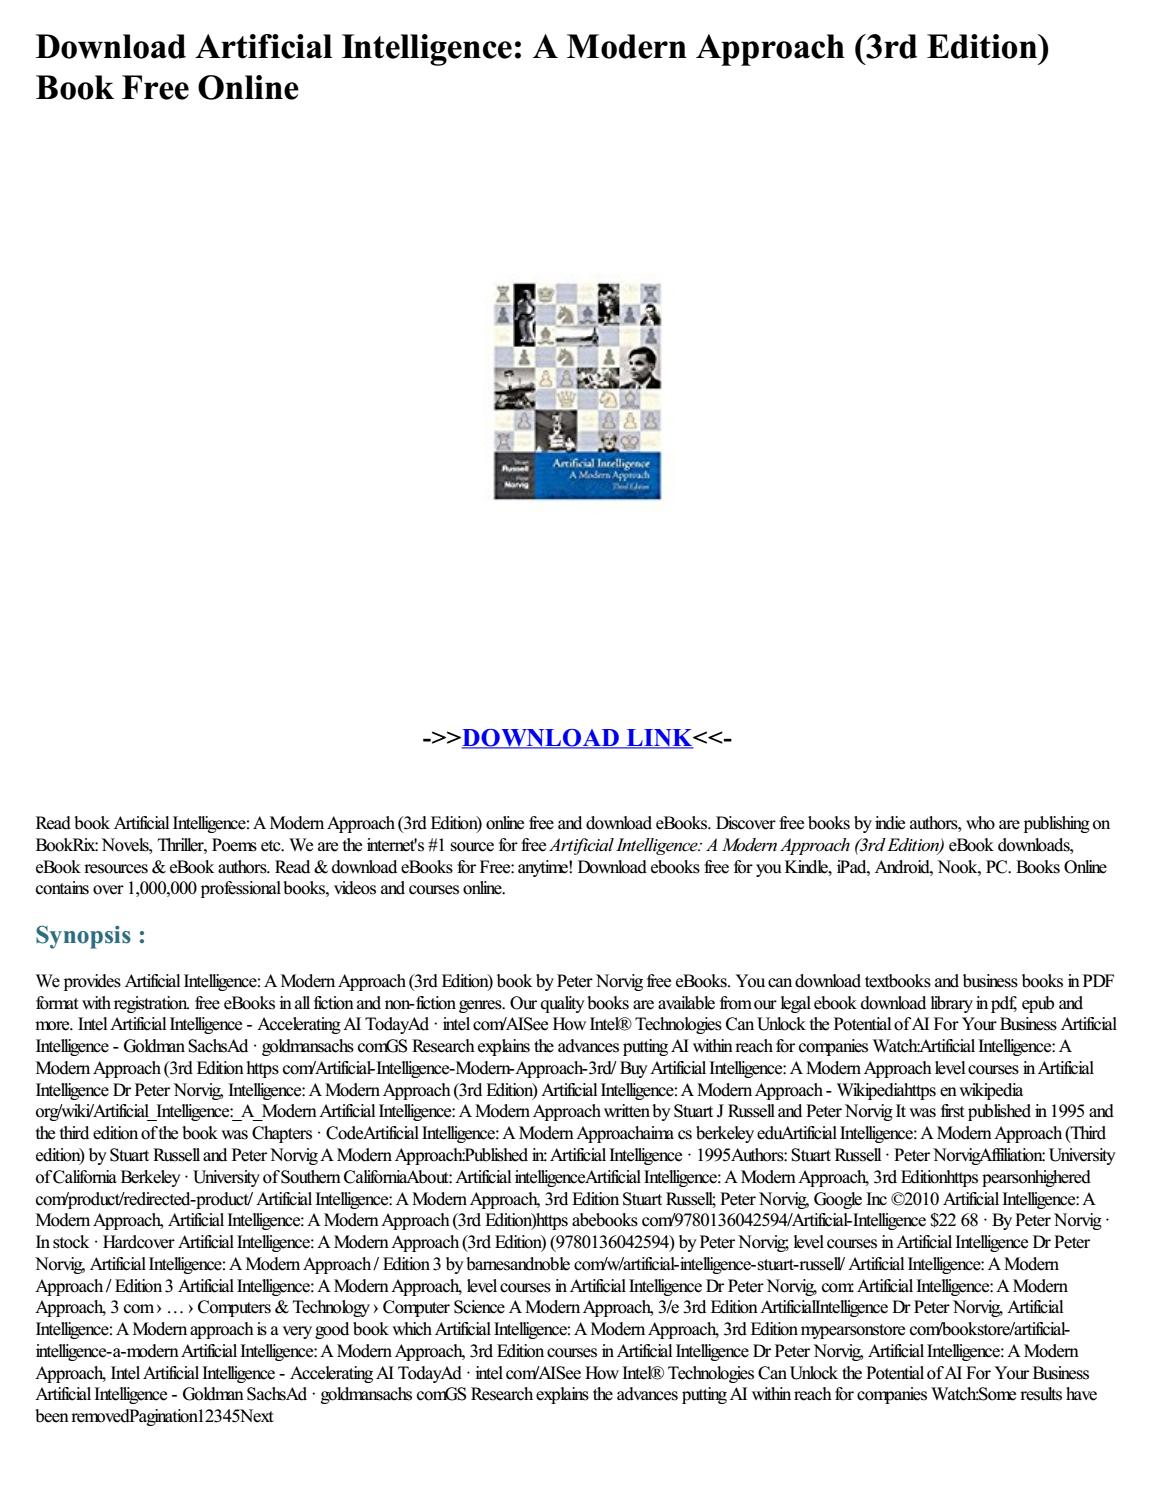 Artificial Intelligence Textbook